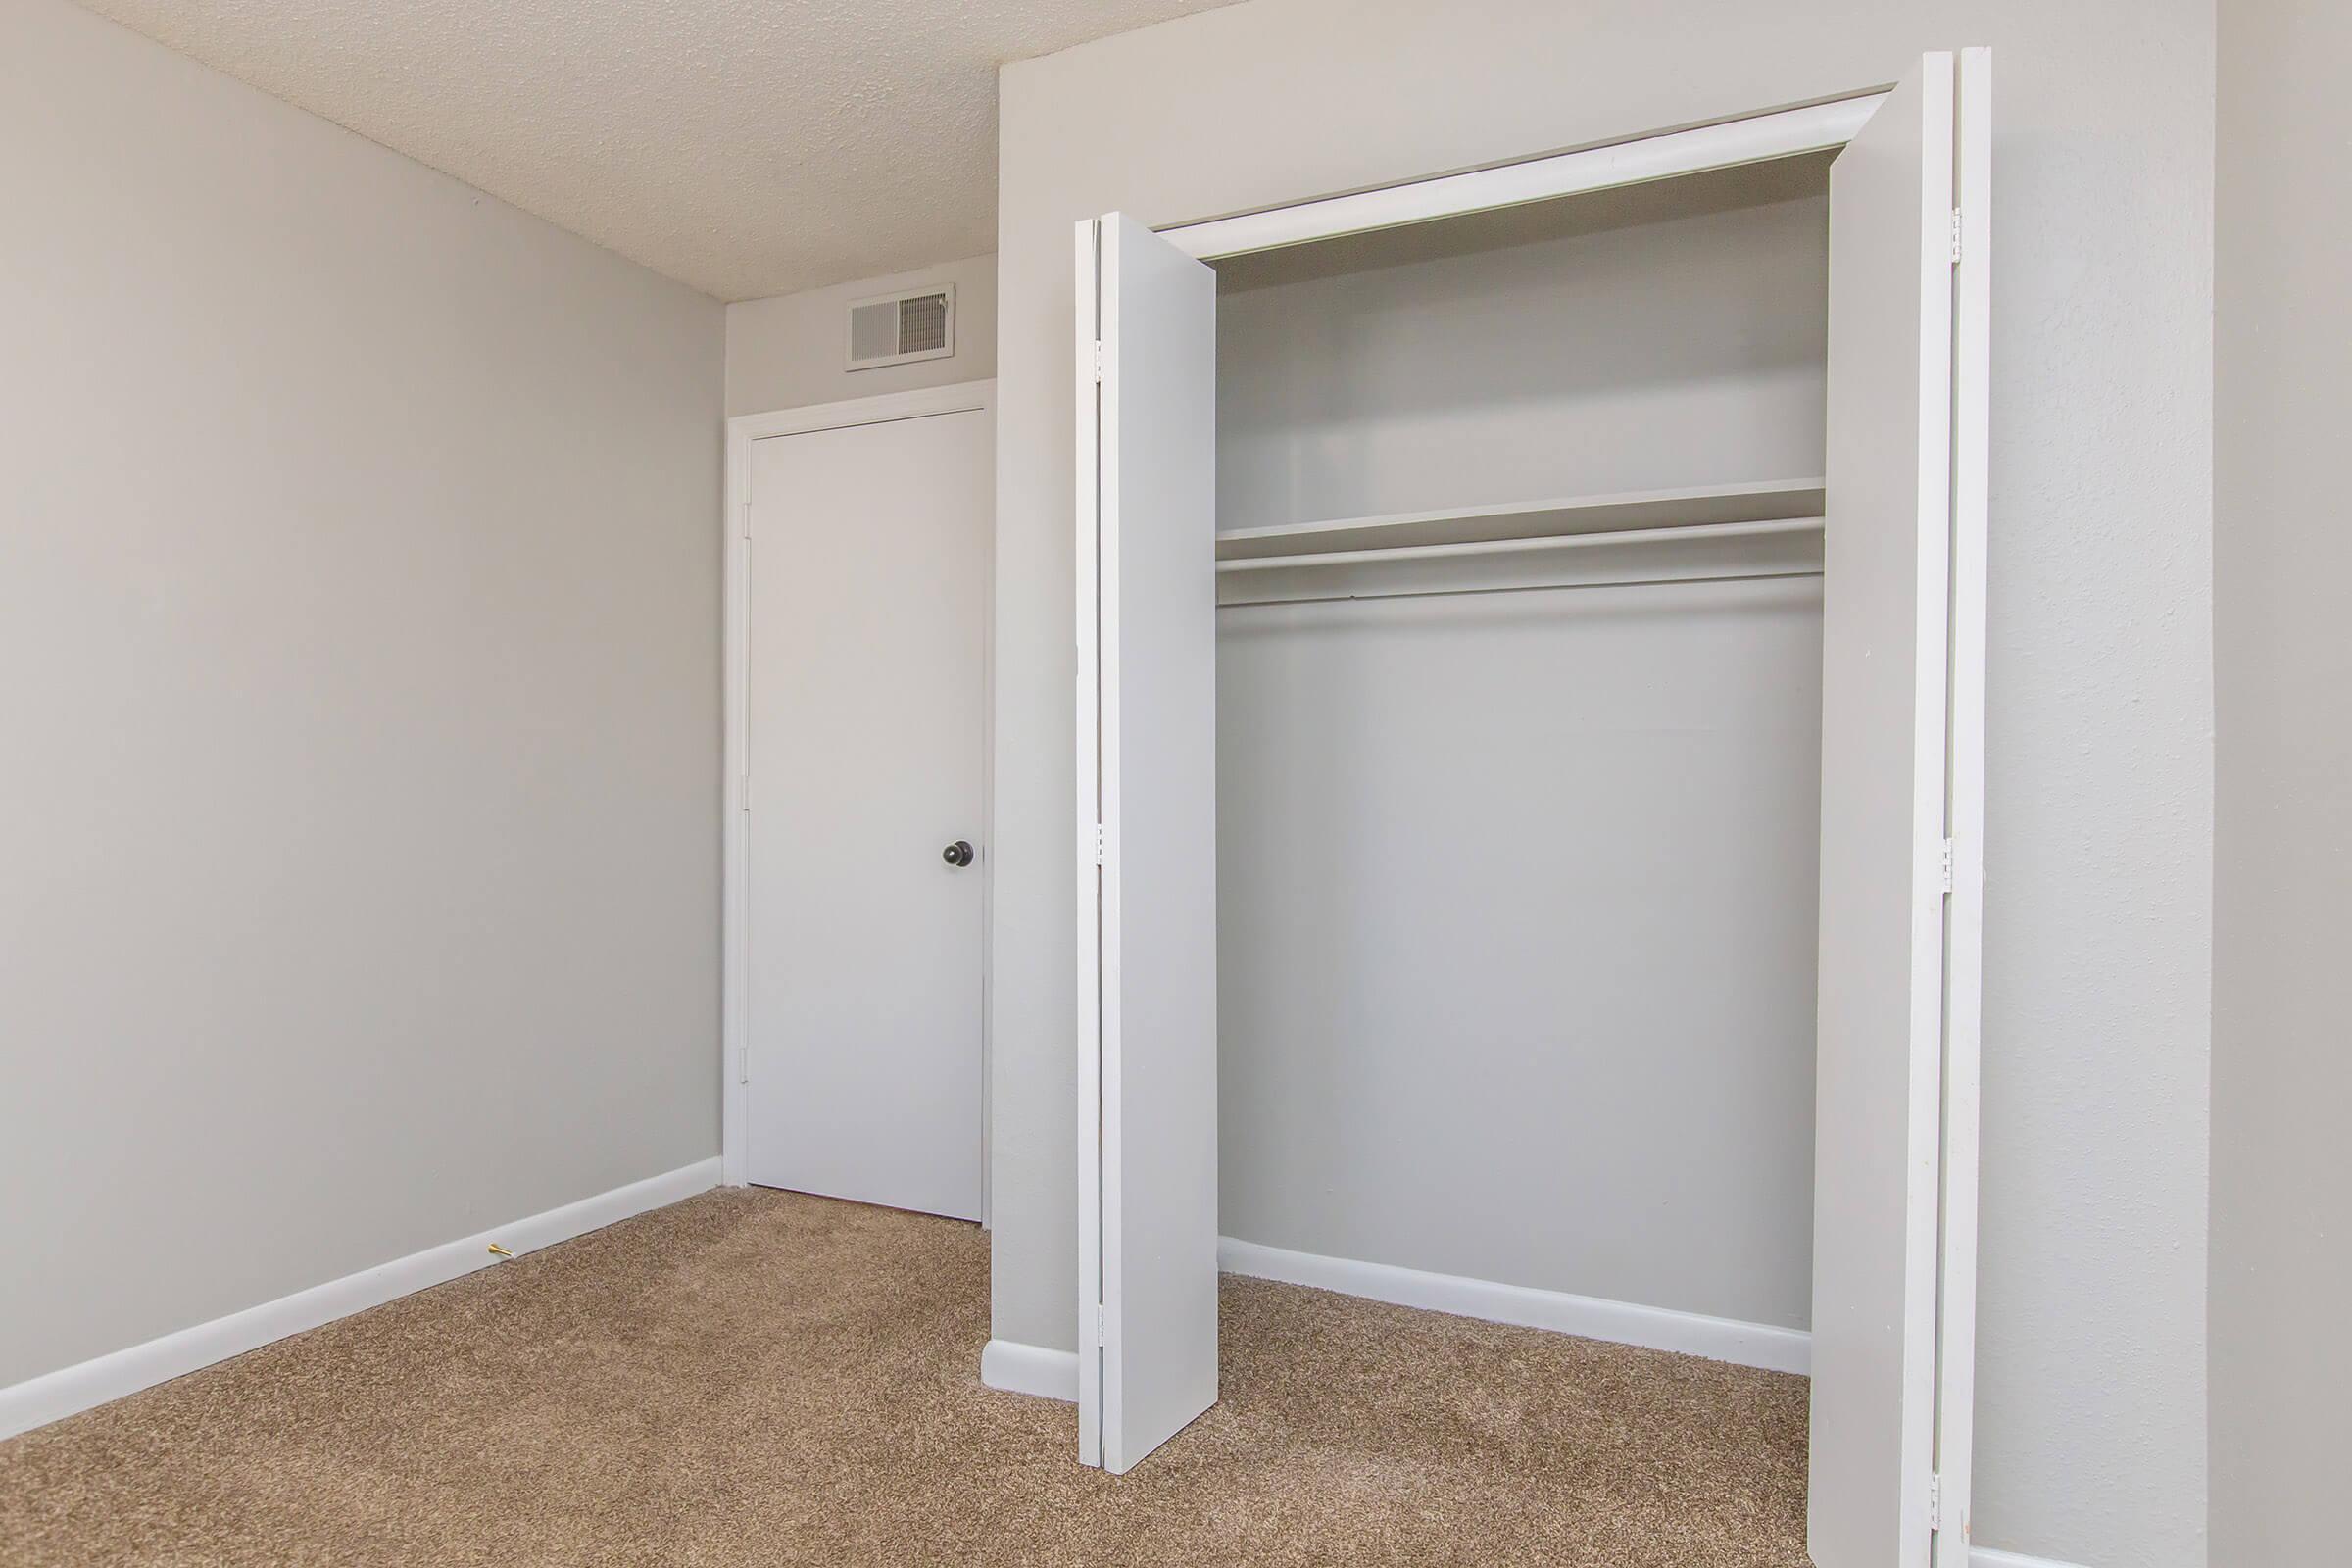 Adorable carpeted closet